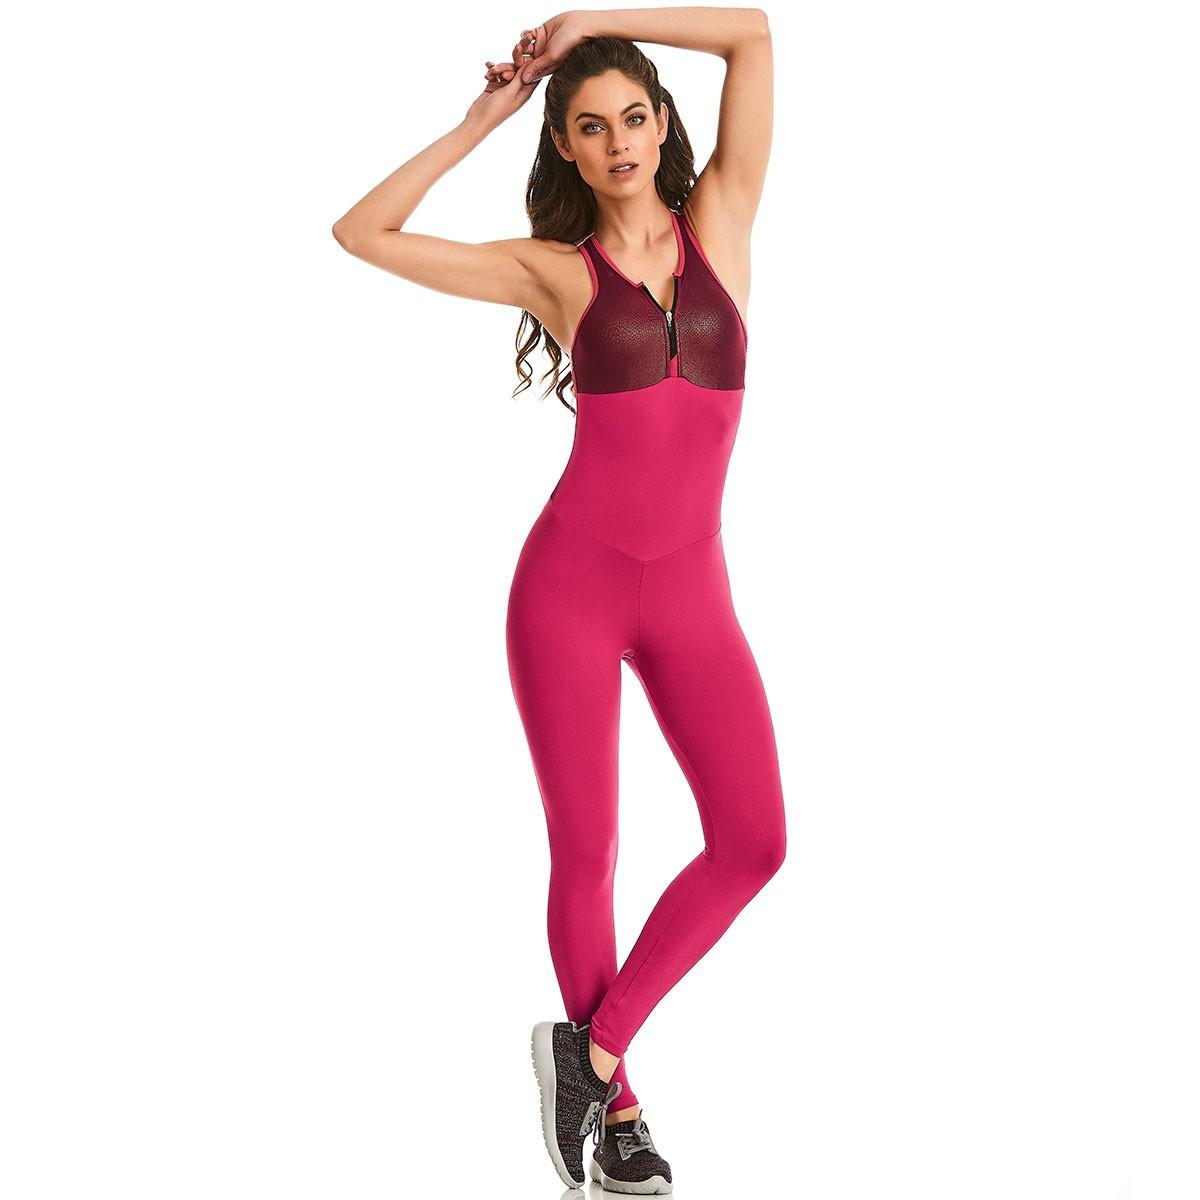 Macacão NZ Bojo Now Rosa CAJUBRASIL Asctivewear